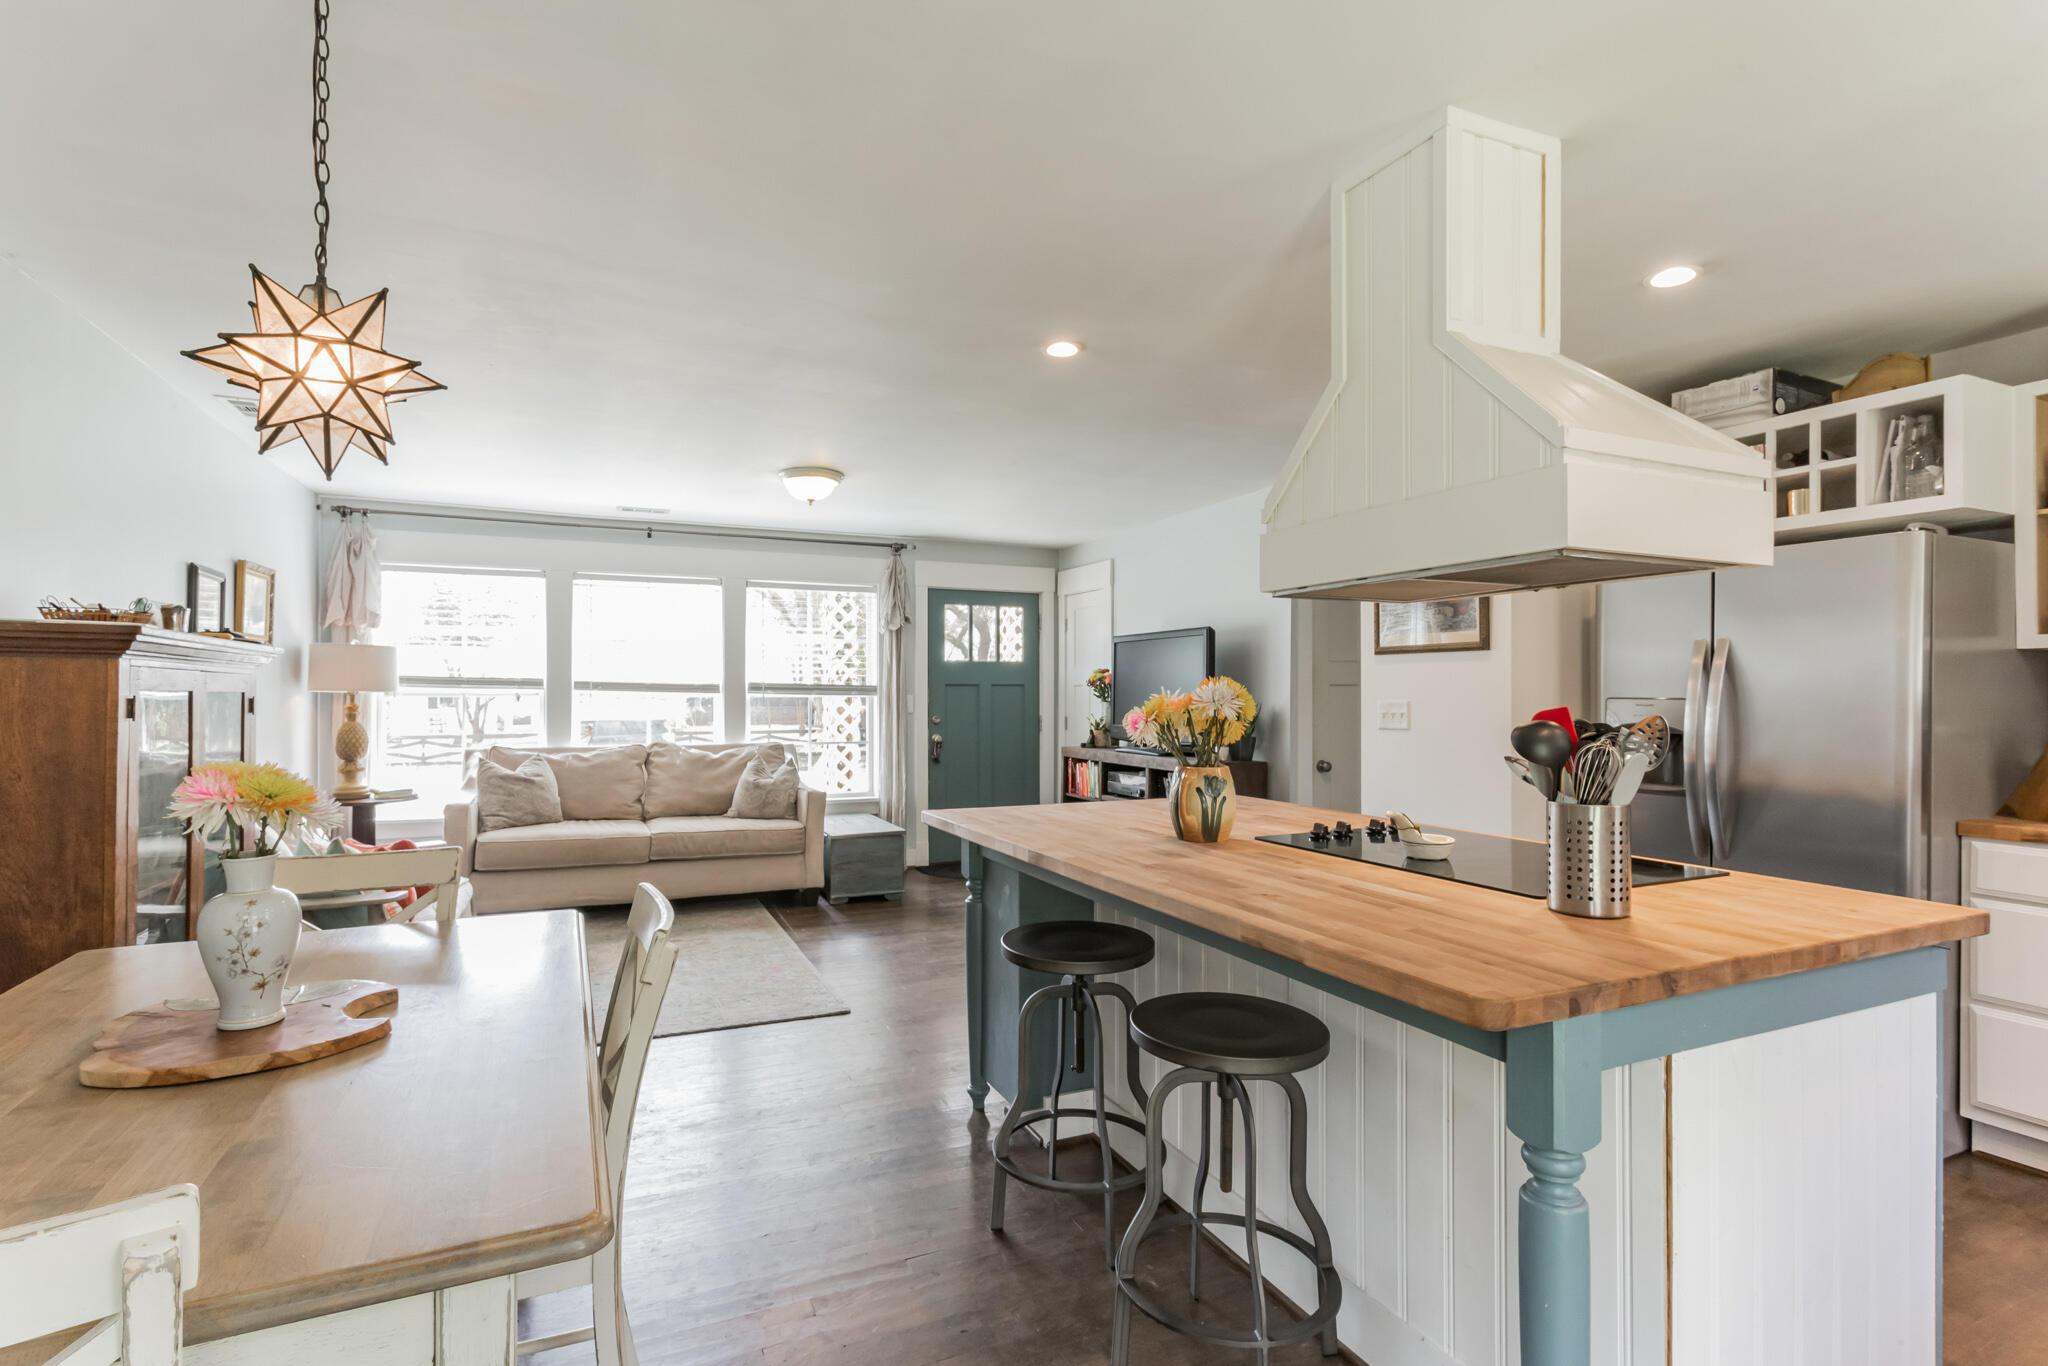 Stafford Heights Homes For Sale - 3472 Cynthia, Johns Island, SC - 0